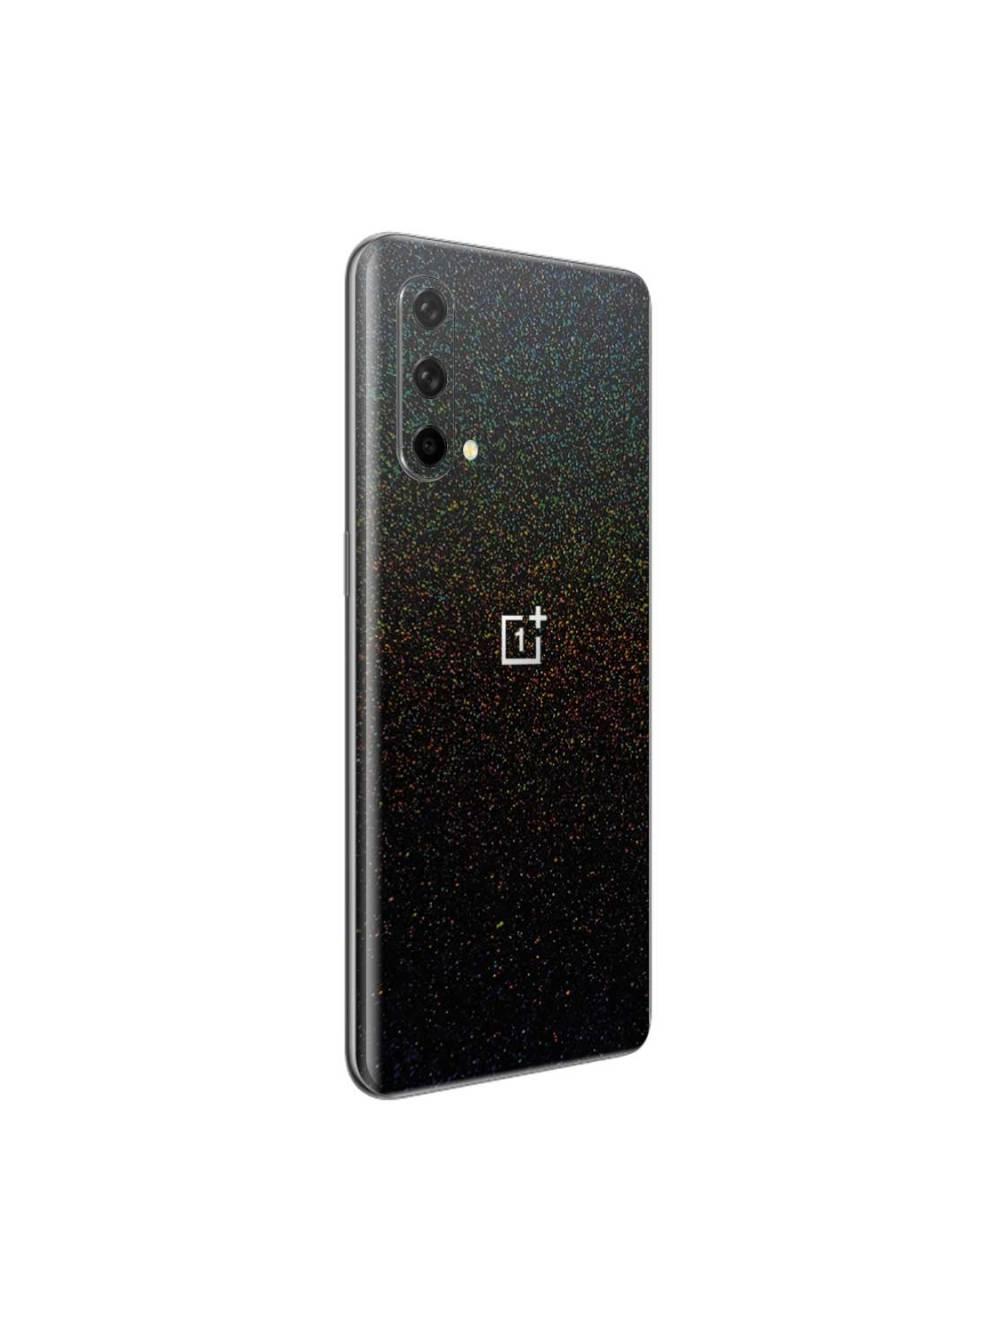 OnePlus Nord CE Skin Wrap